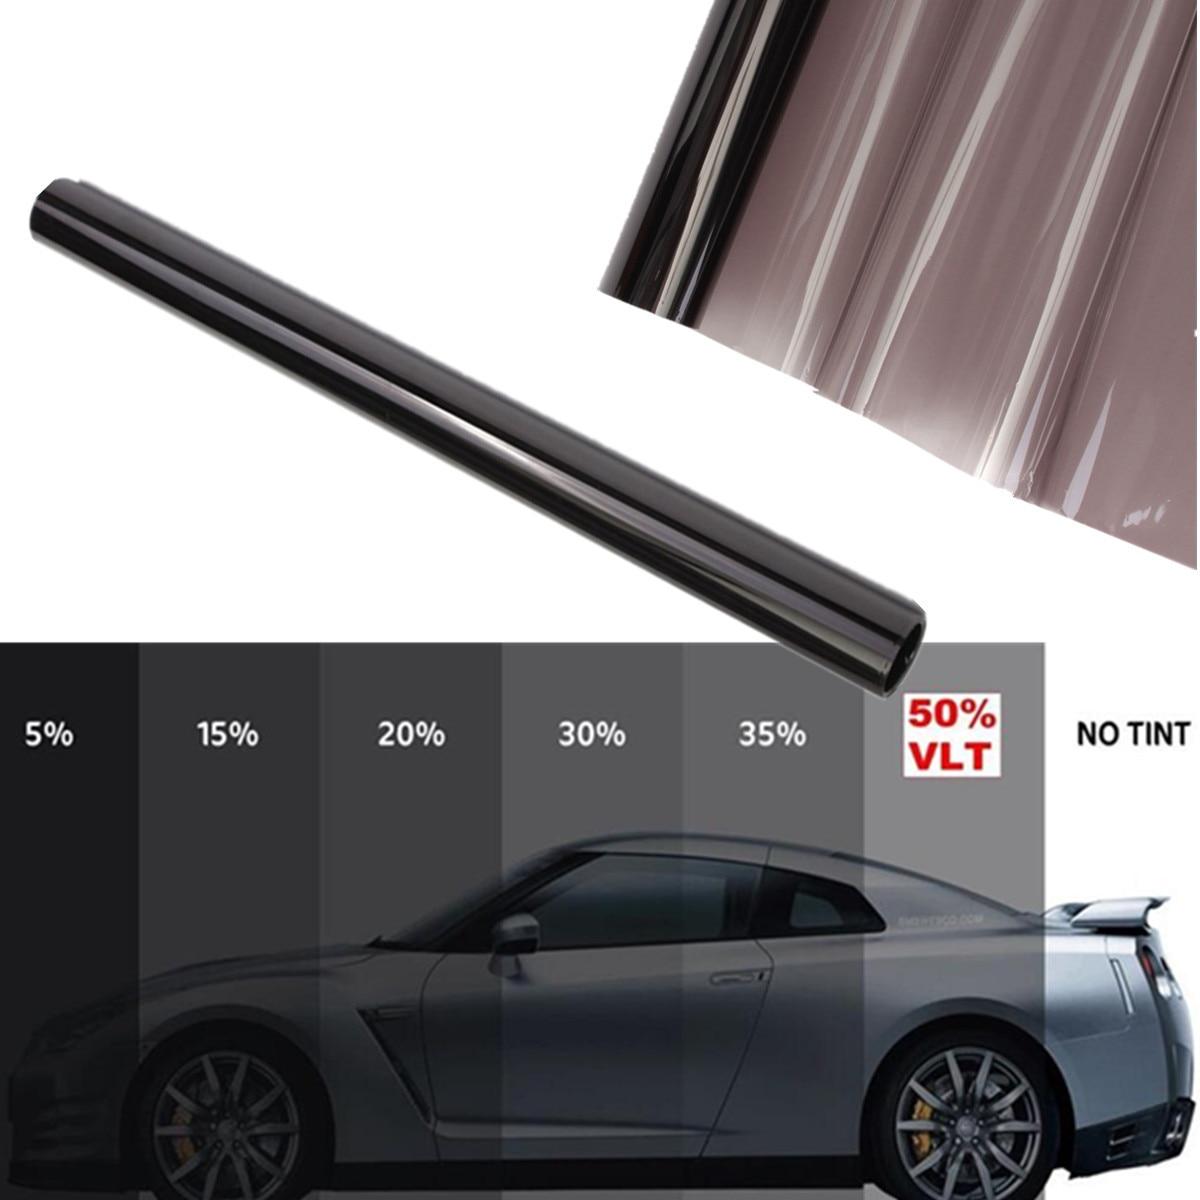 Autoleader 50cmx6m Dark Black Car Window Tint Film Glass 1percent-50percent Roll Summer Car Auto Home Windows Glass Tinting Solar Protection